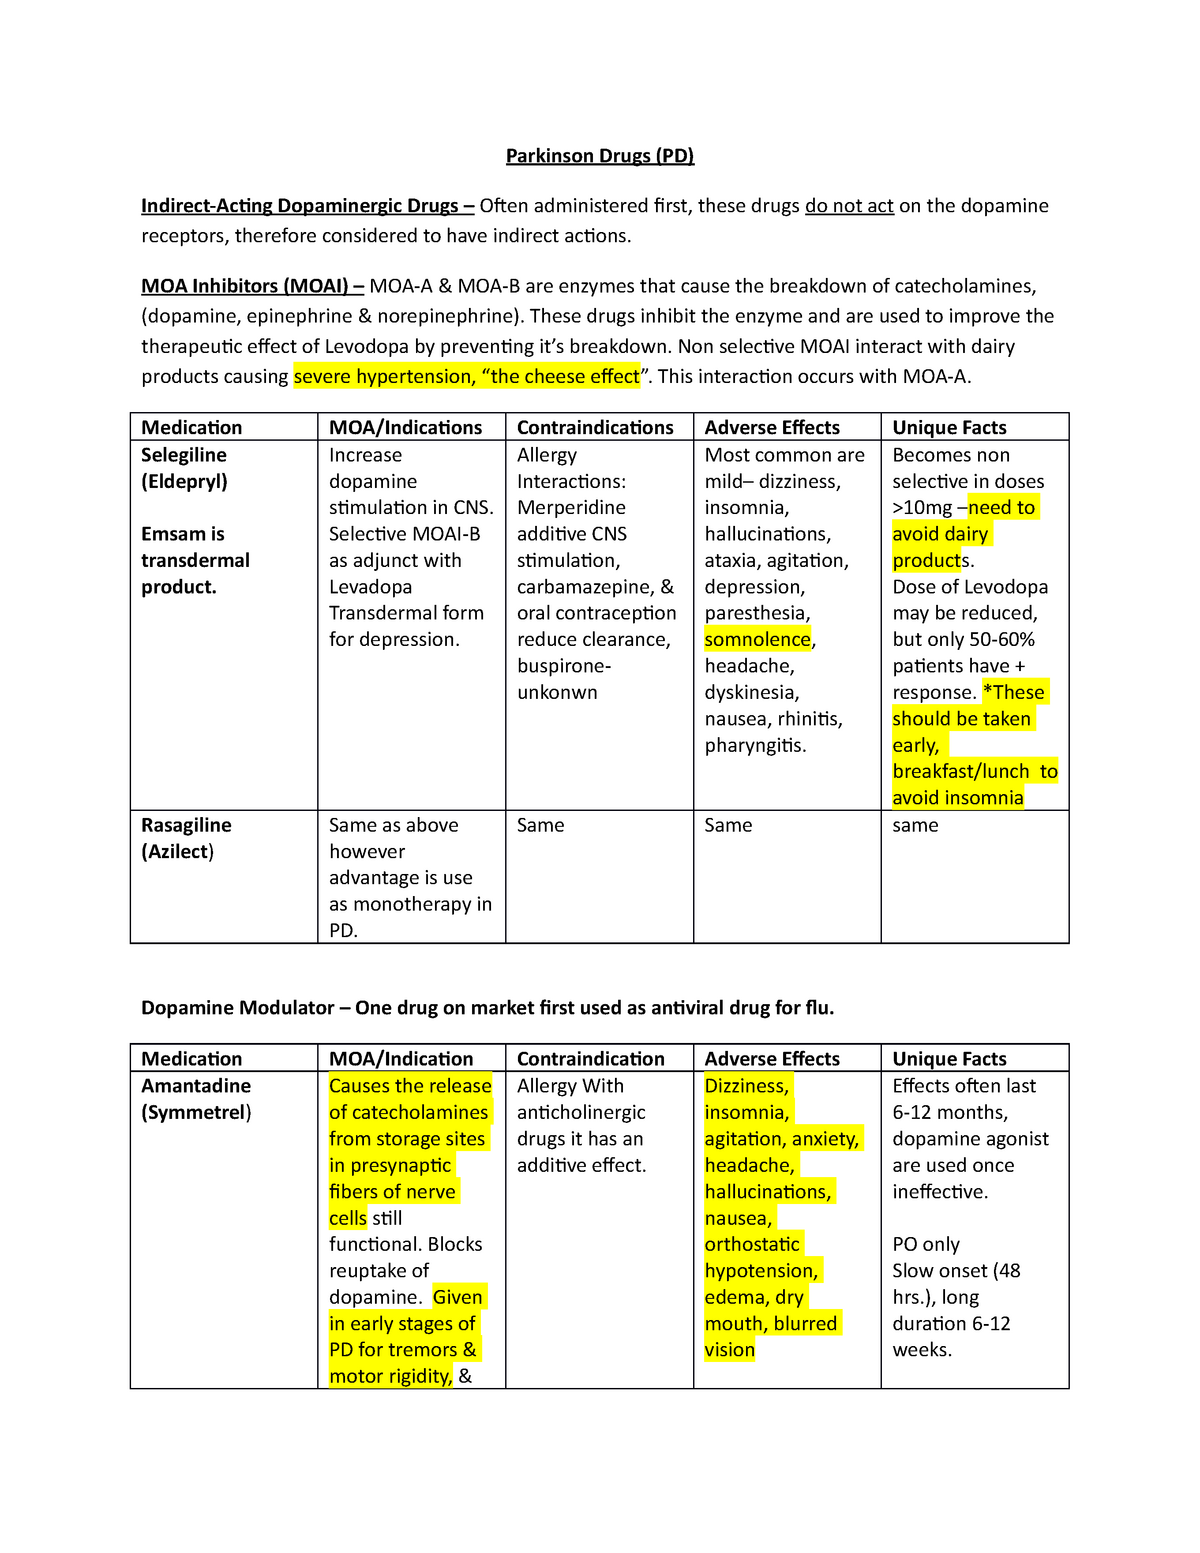 Parkinson Drugs - PHRP 7006: Clinical Pharmacology: Pharmacodynamics